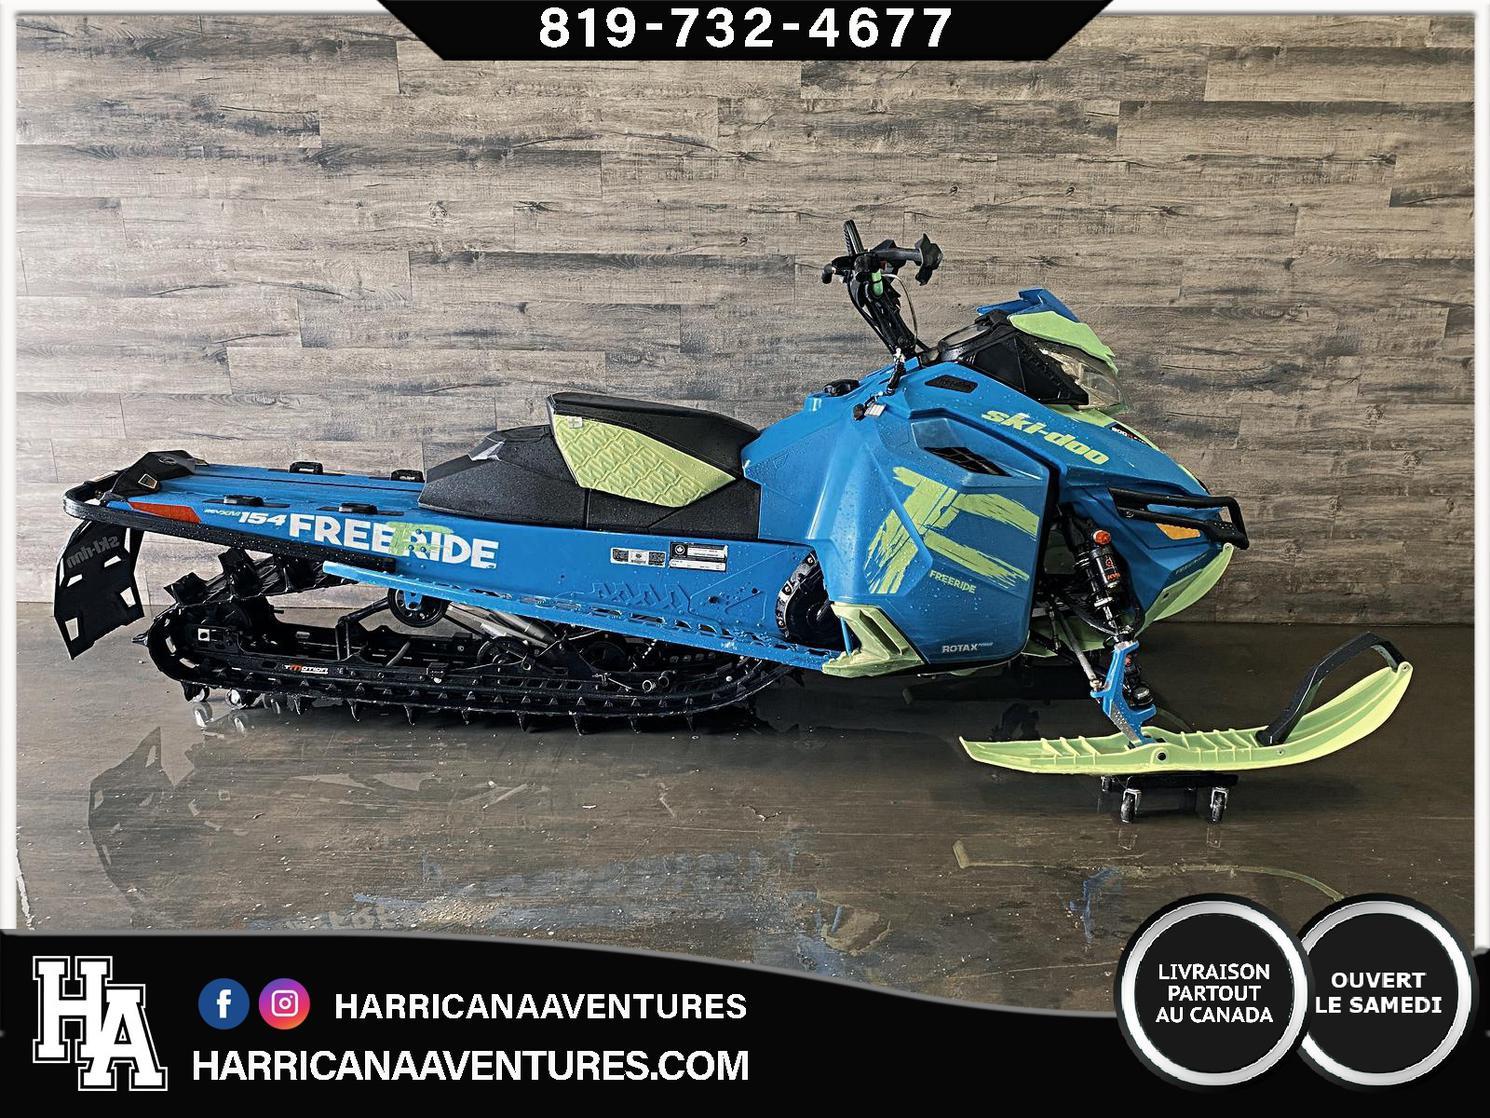 Ski-Doo FREERIDE 800 154 2018